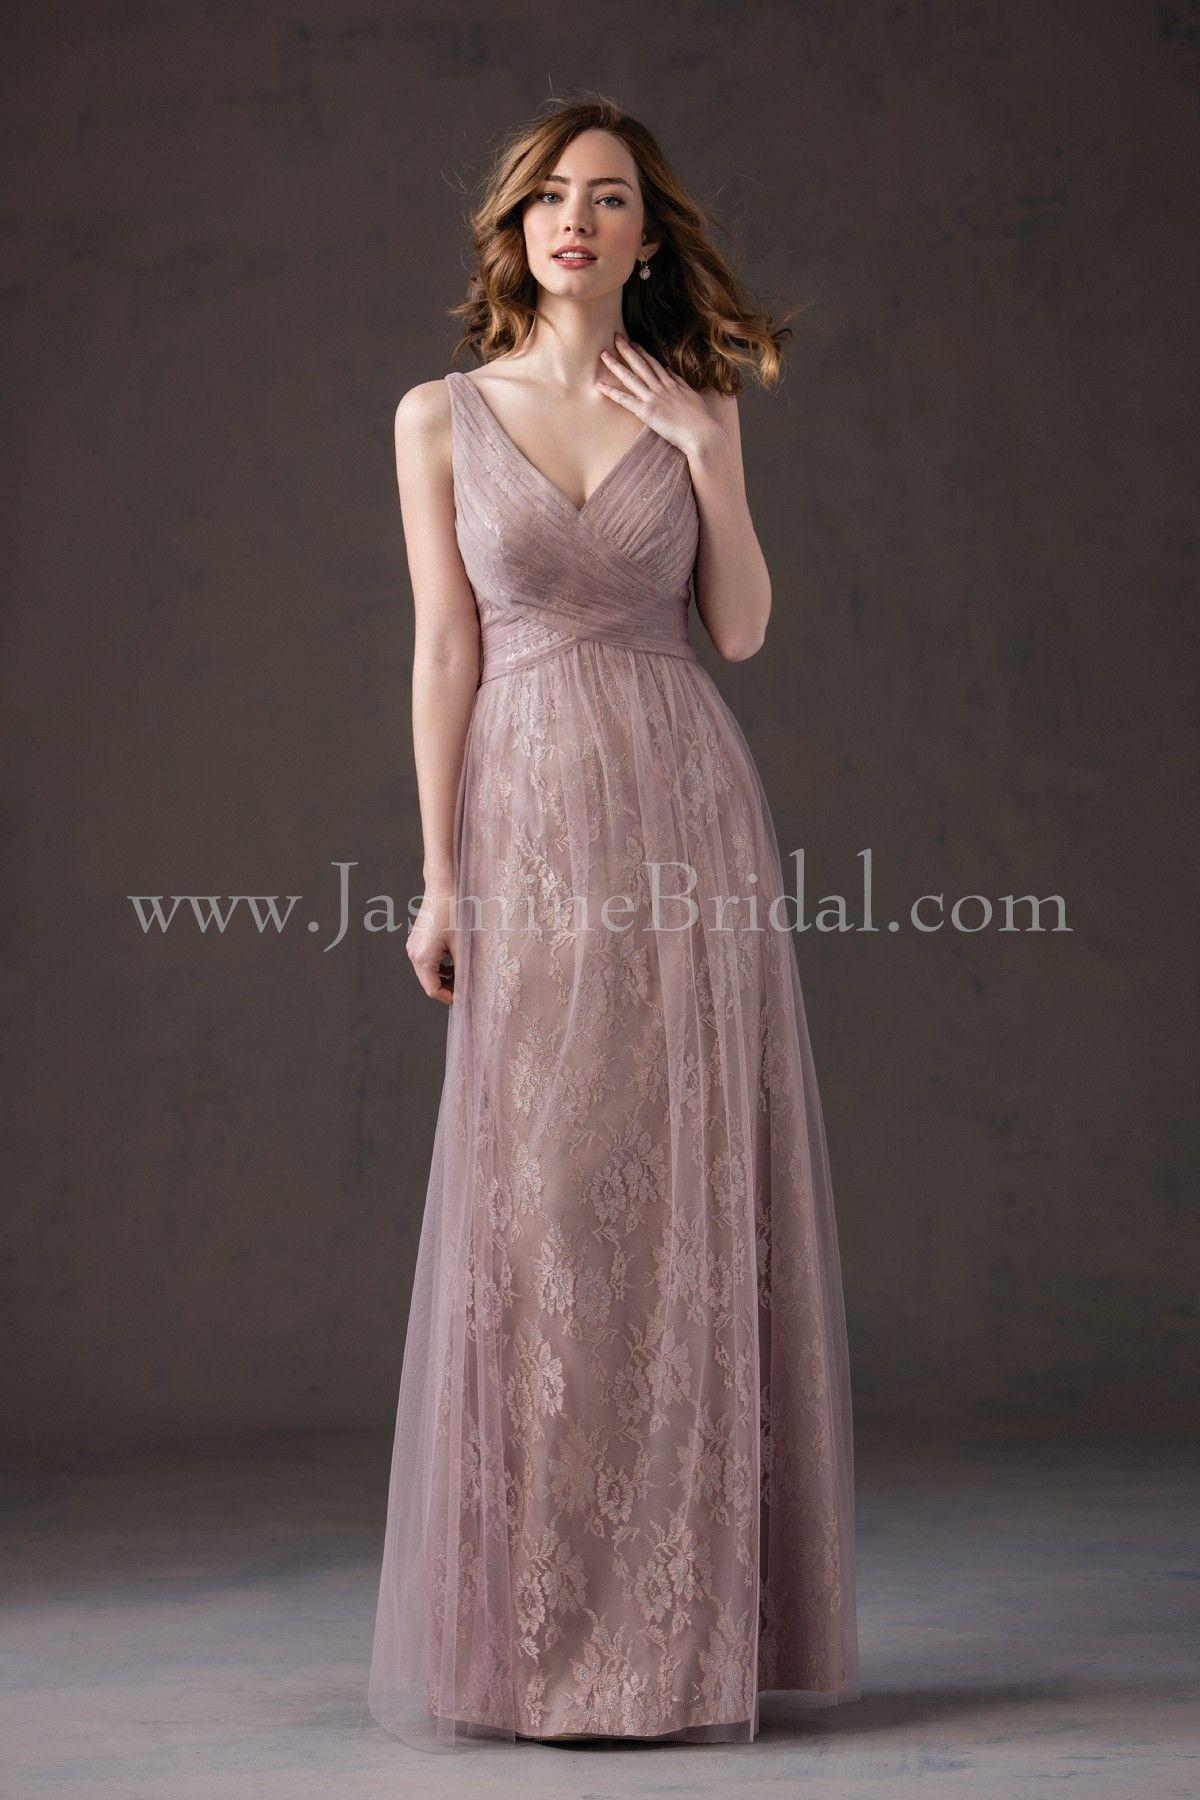 Jasmine Bridal Bridesmaid Dress Belsoie Style L184066 In Sandbar